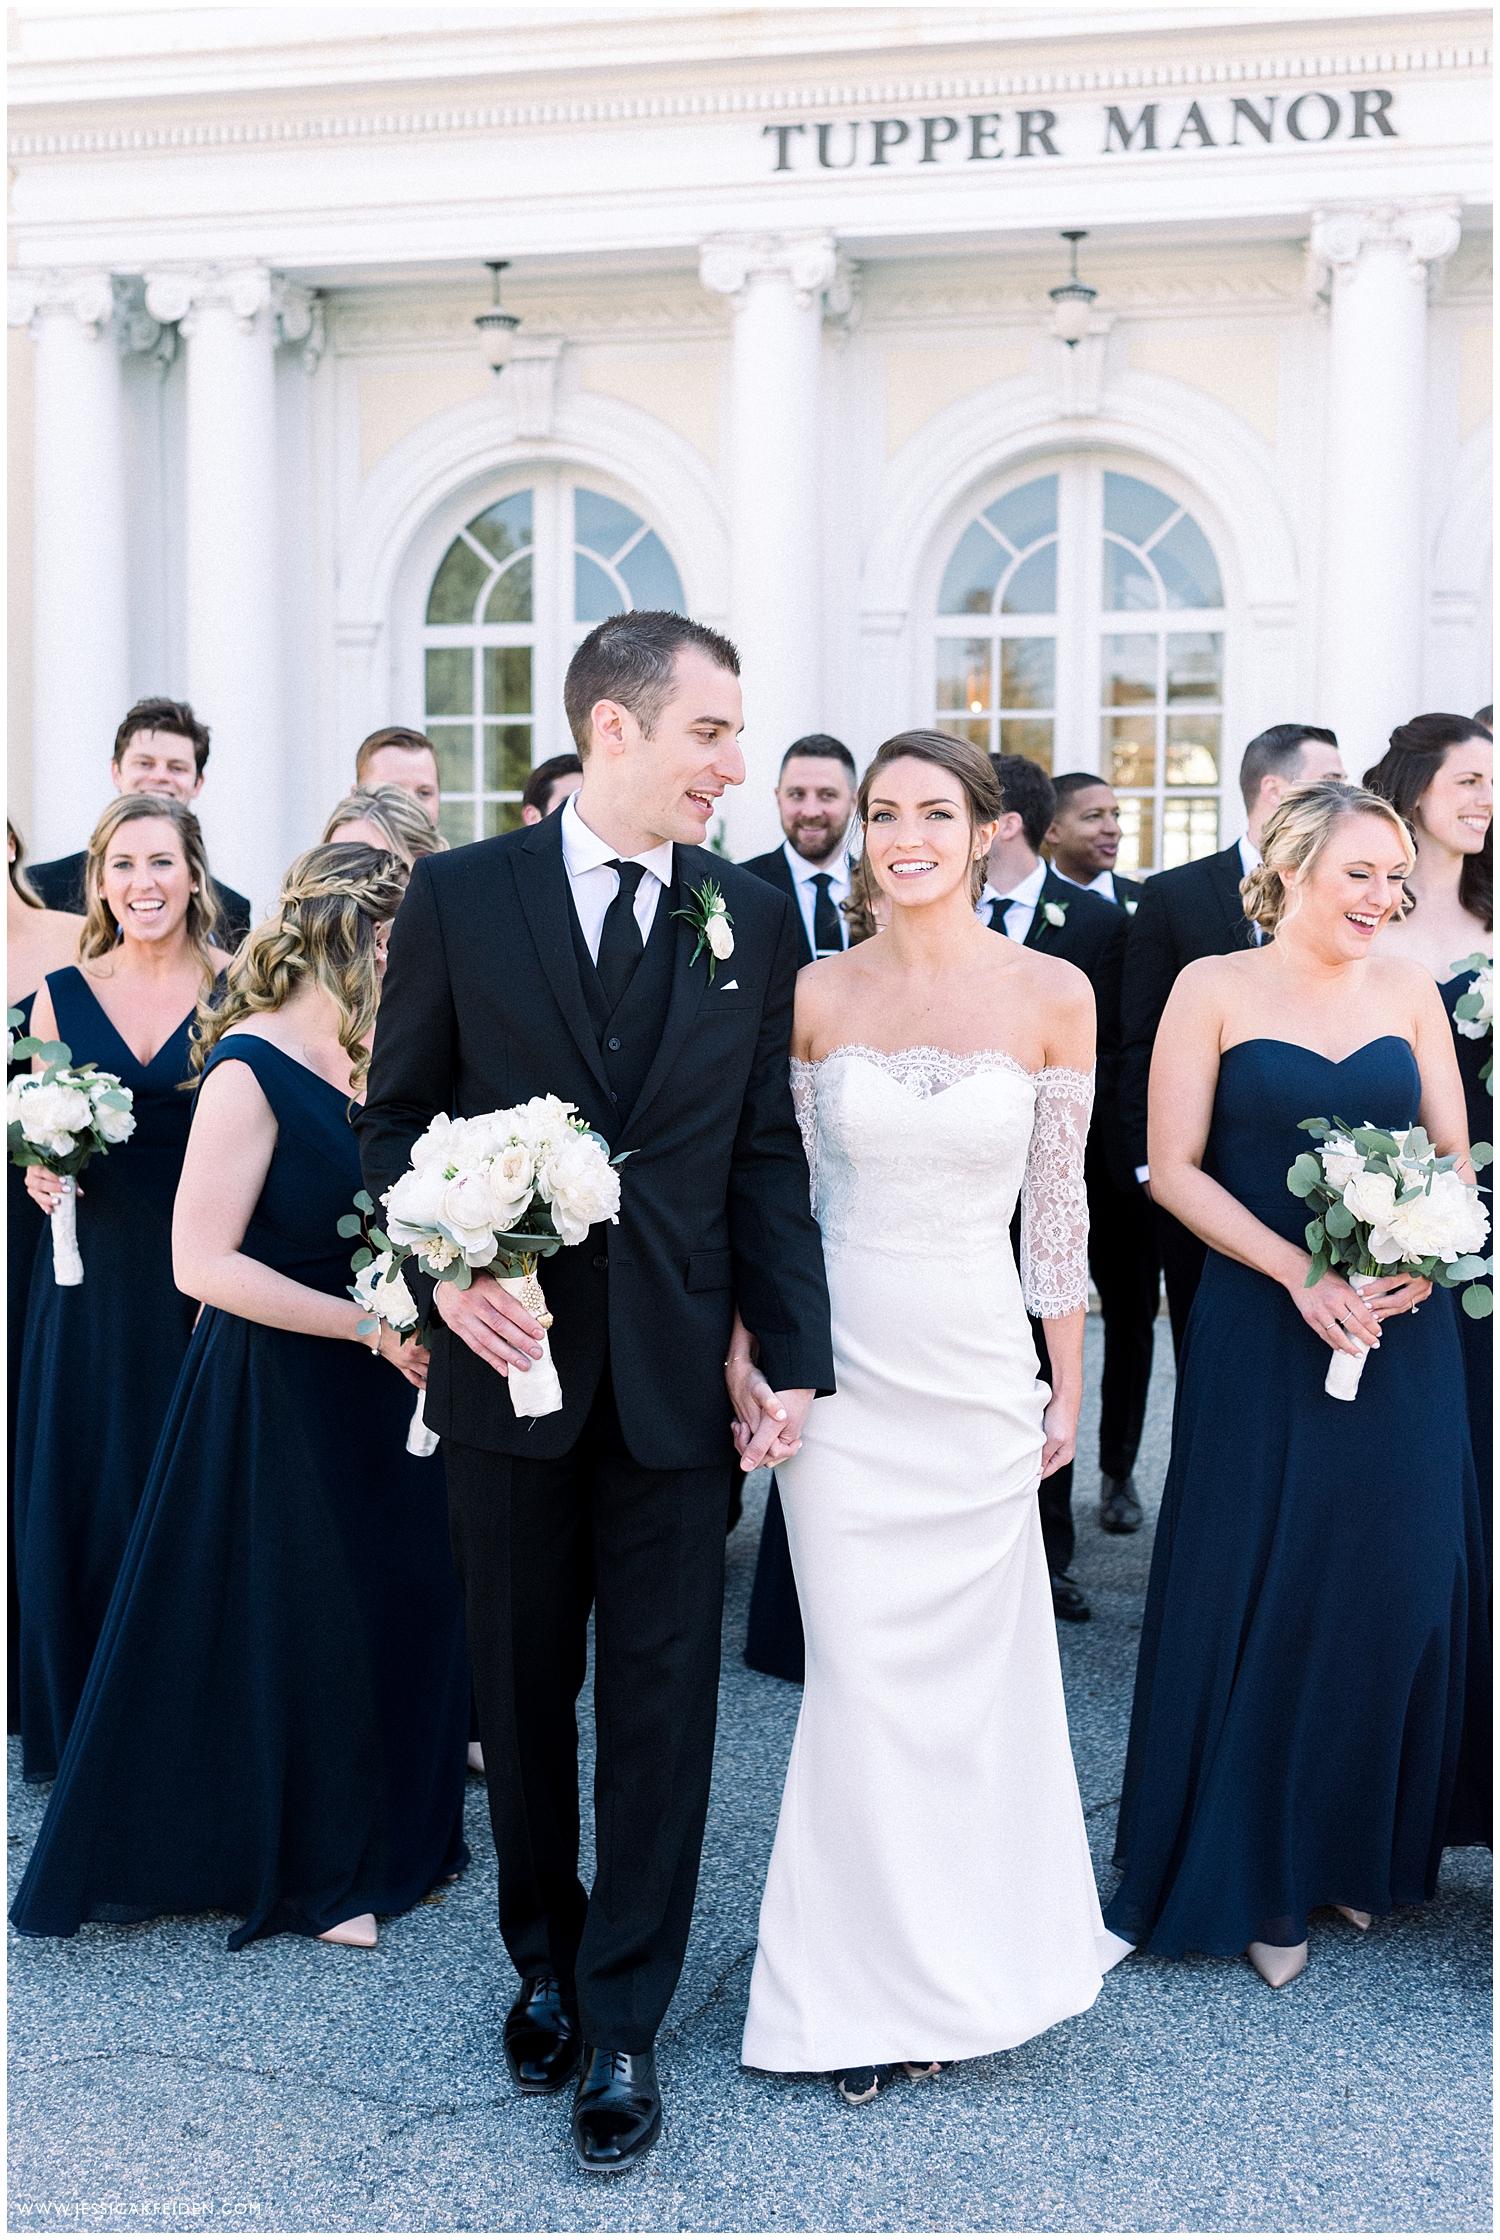 Jessica K Feiden Photography_Tupper Manor Beverly Wedding Photographer_0036.jpg